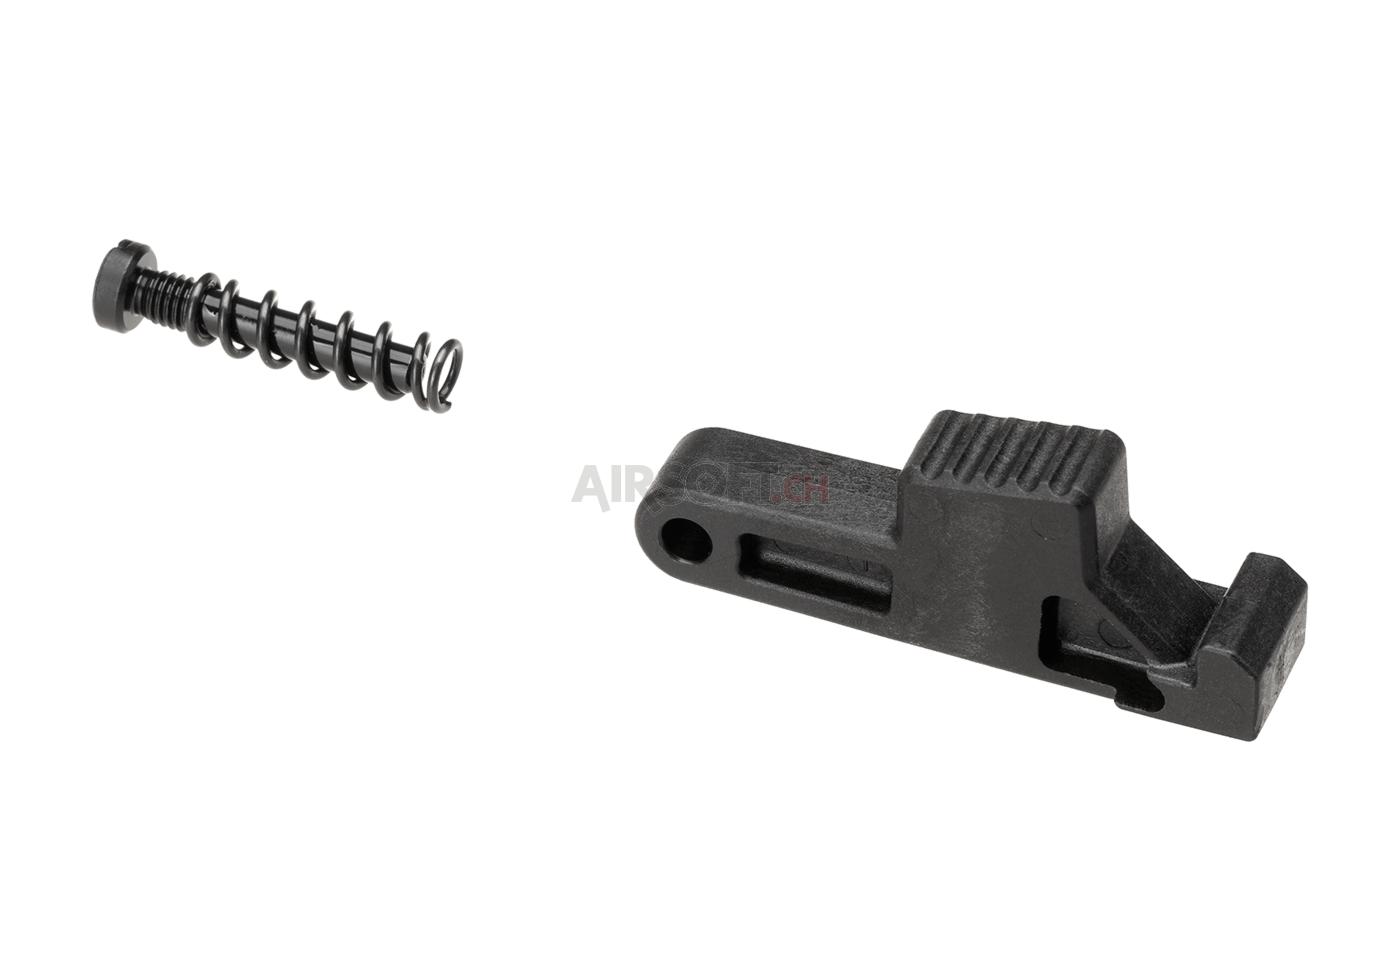 Laser Entfernungsmesser Vector : Bmi laser and levelling technology